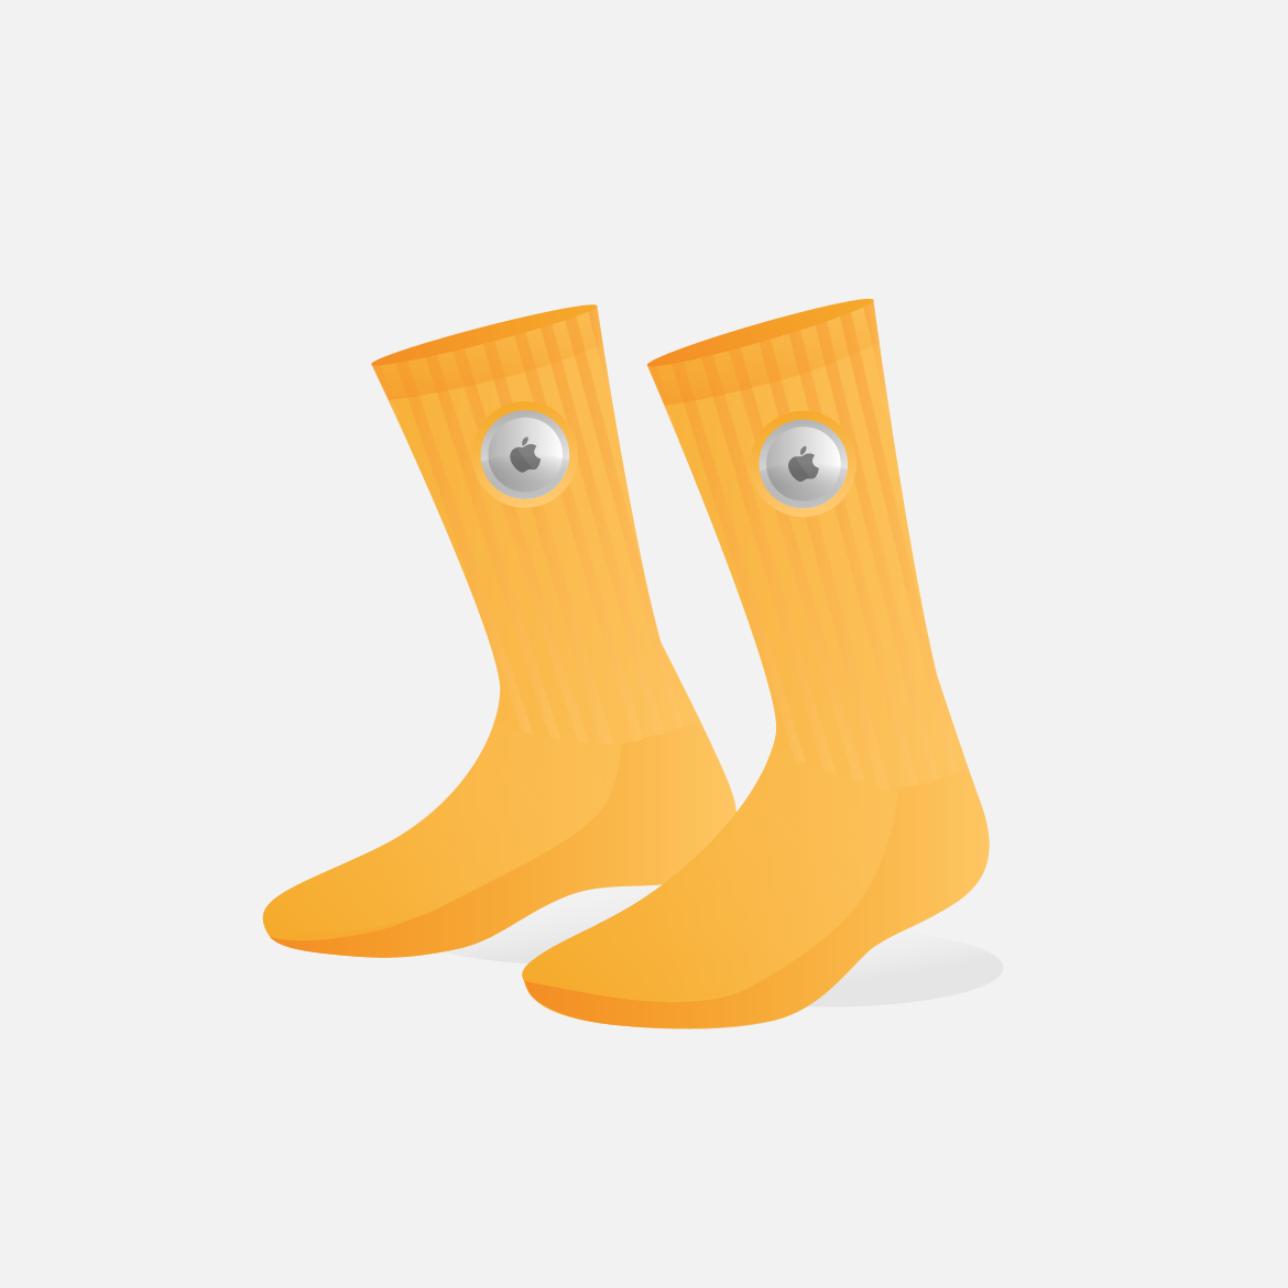 amy-jones-mackeeper-apple-concept-socks-find-my@2x